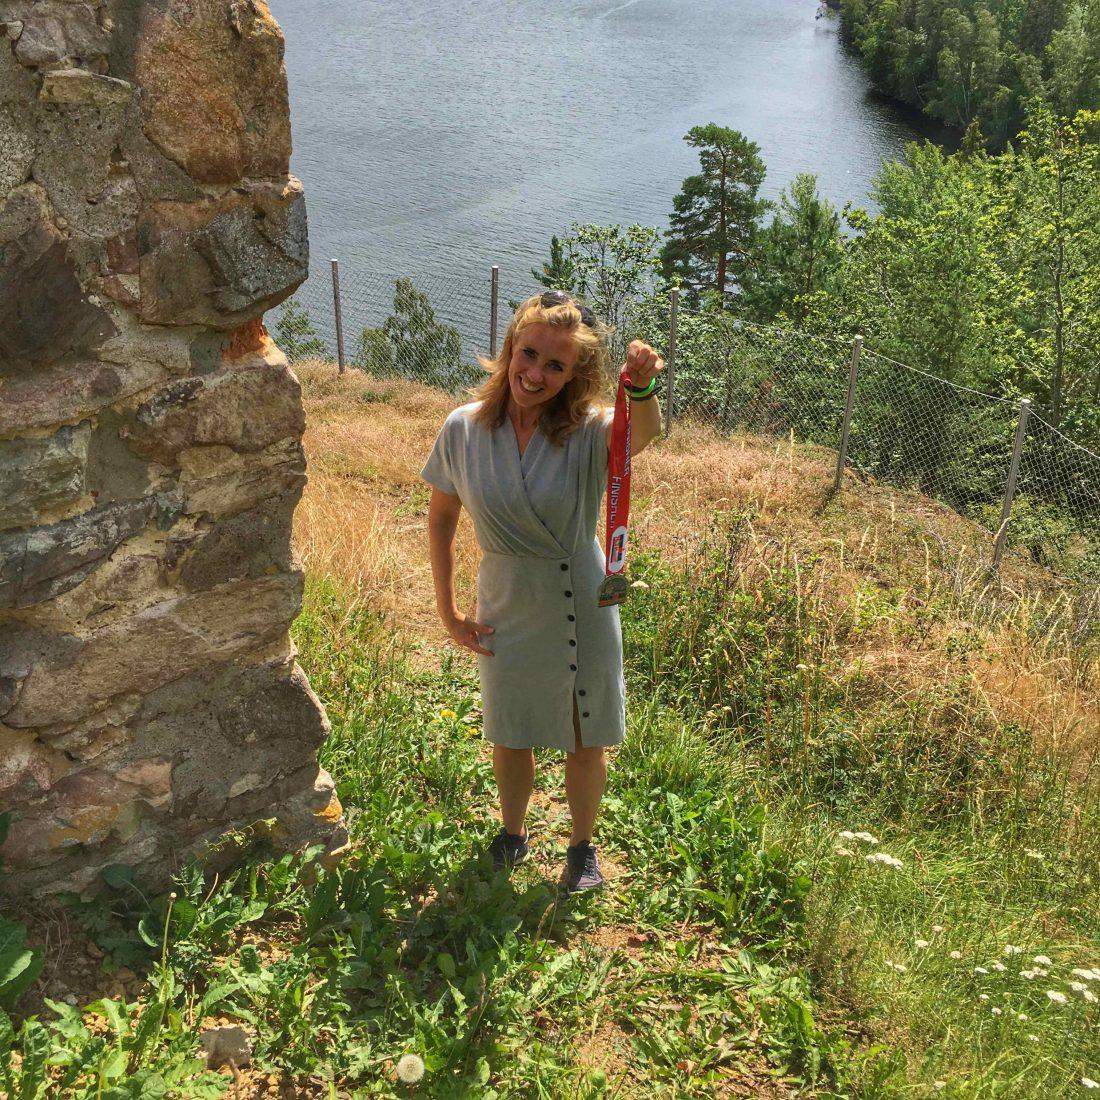 Halve Ironman - Wanderlotje